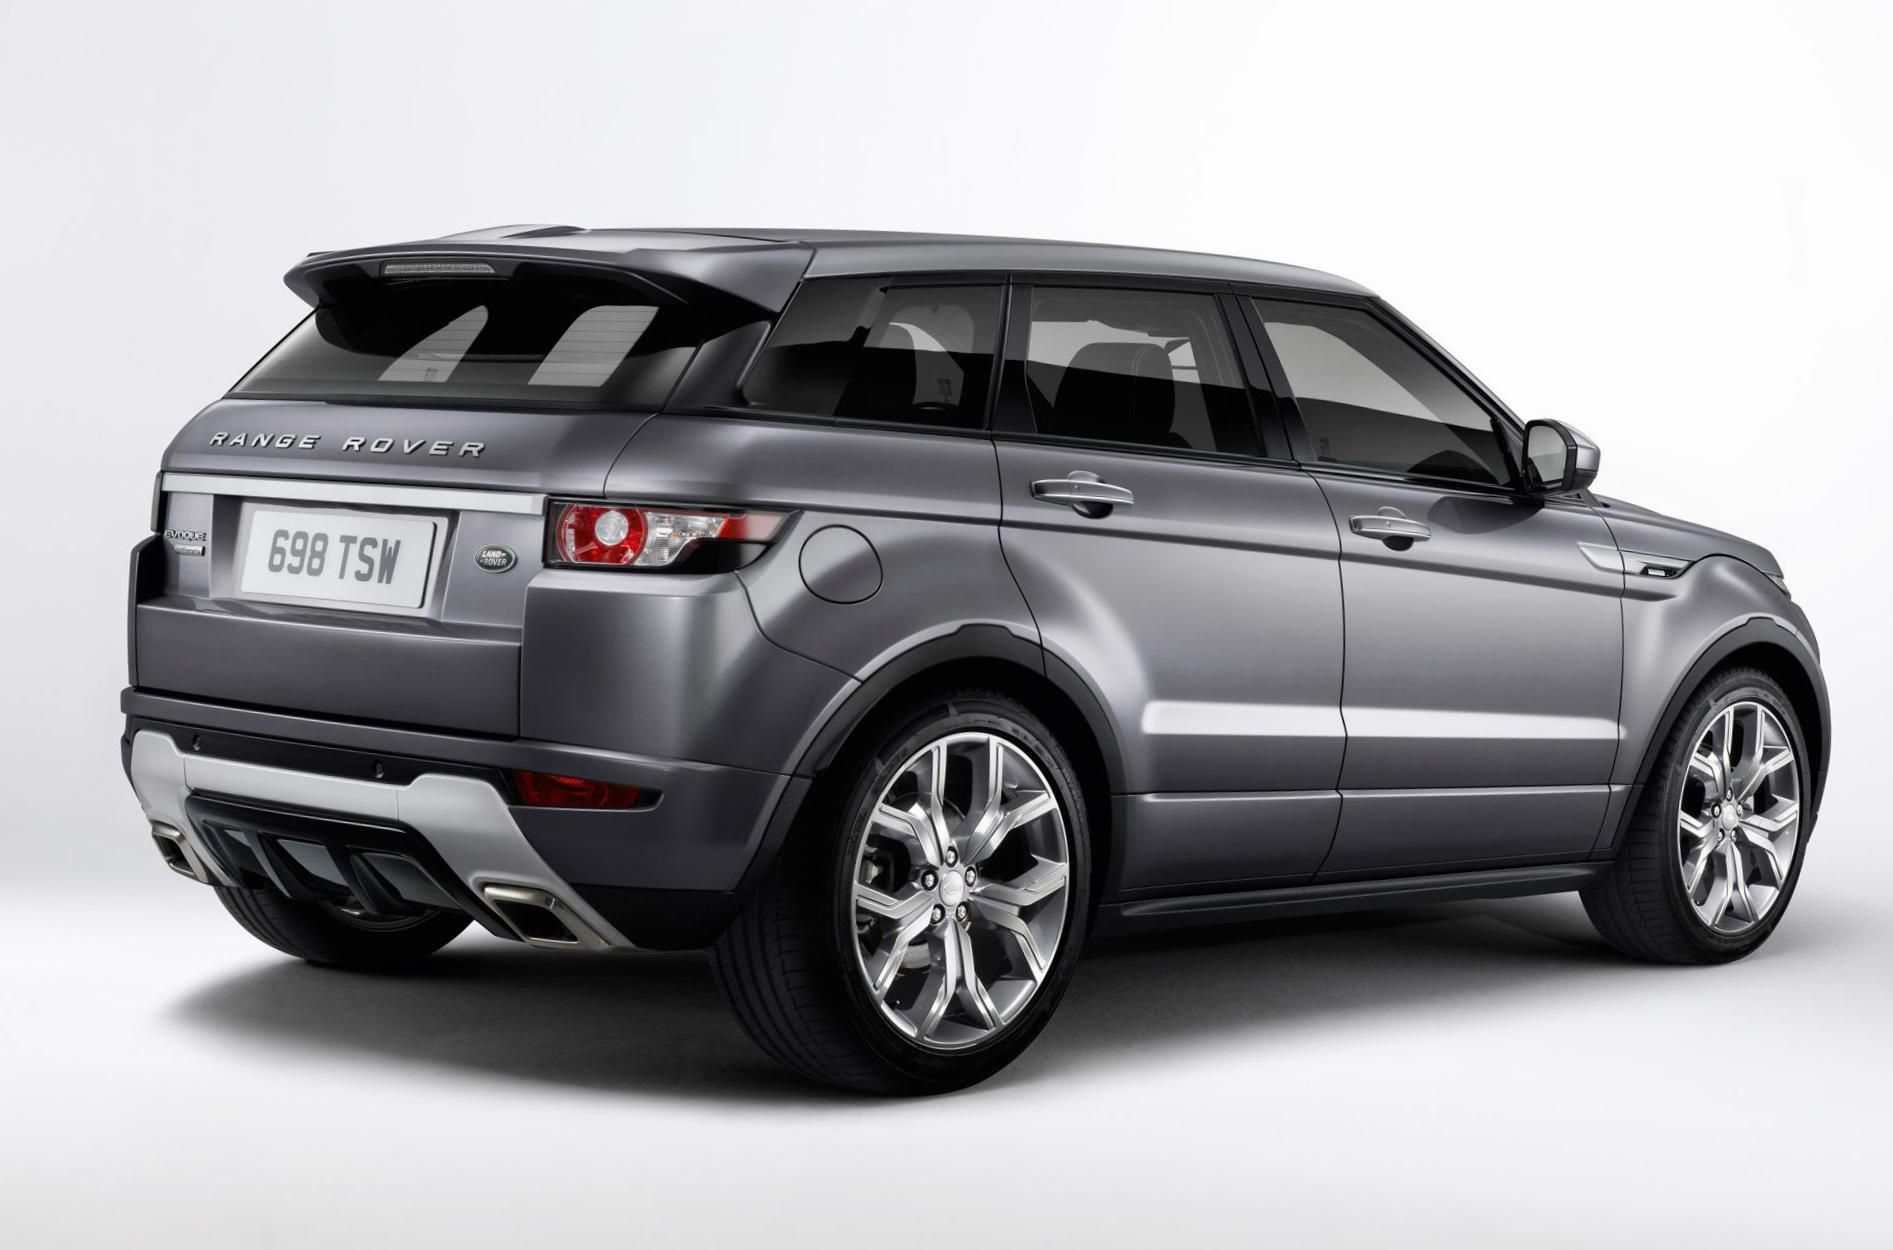 Range Rover Evoque s prestige model in Loire blue This is the